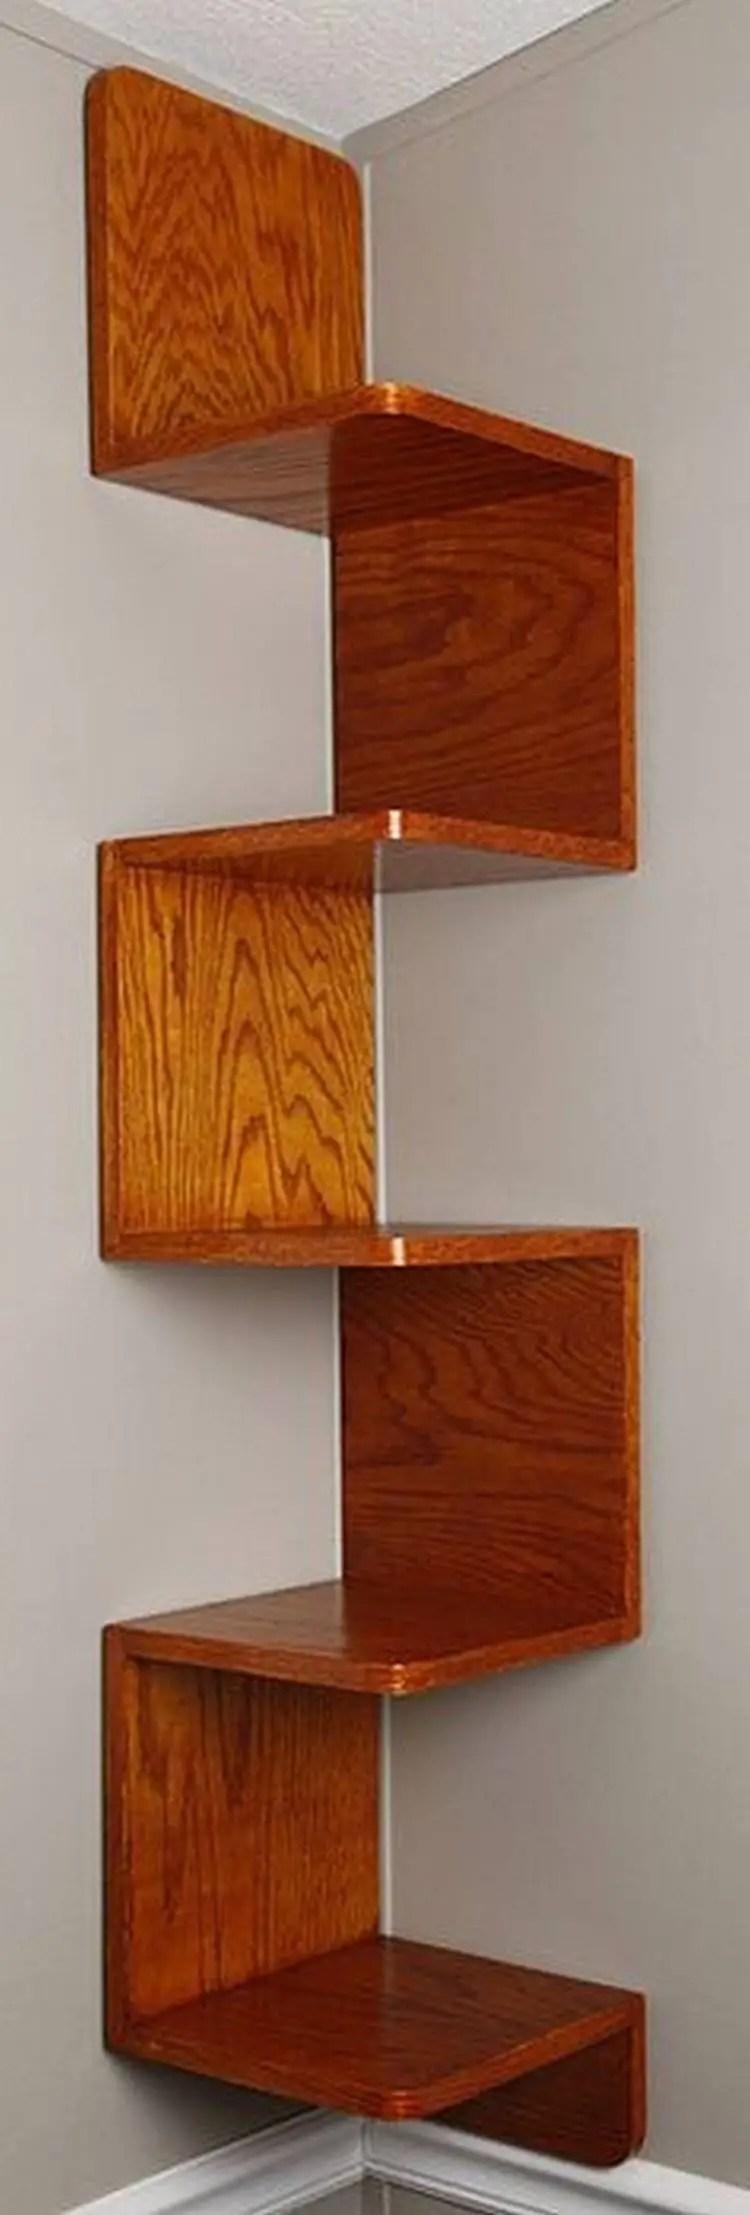 Woodworking Diy Projects Diydrywalls Org